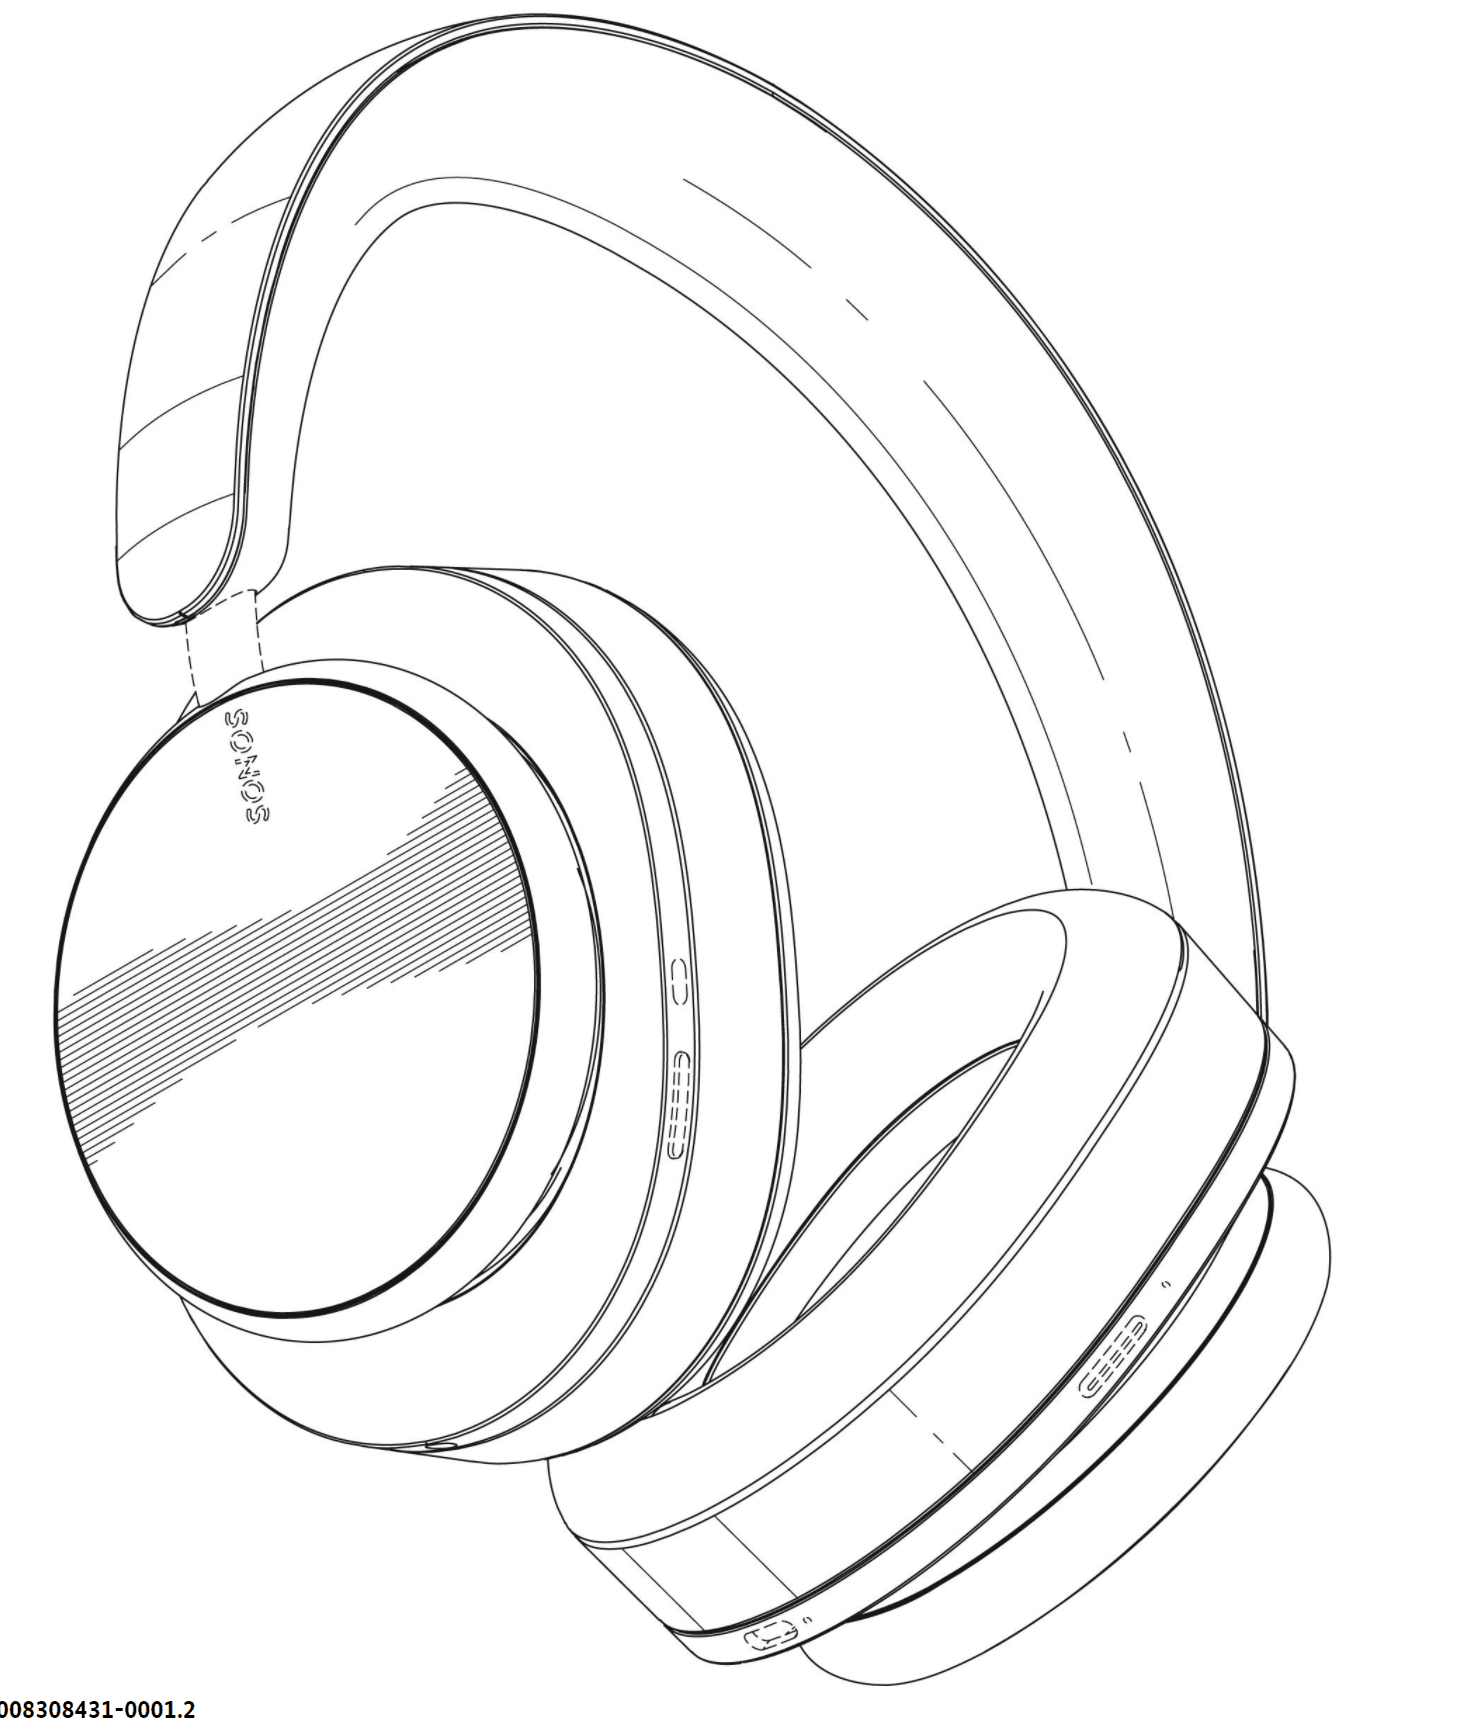 Słuchawki Sonos